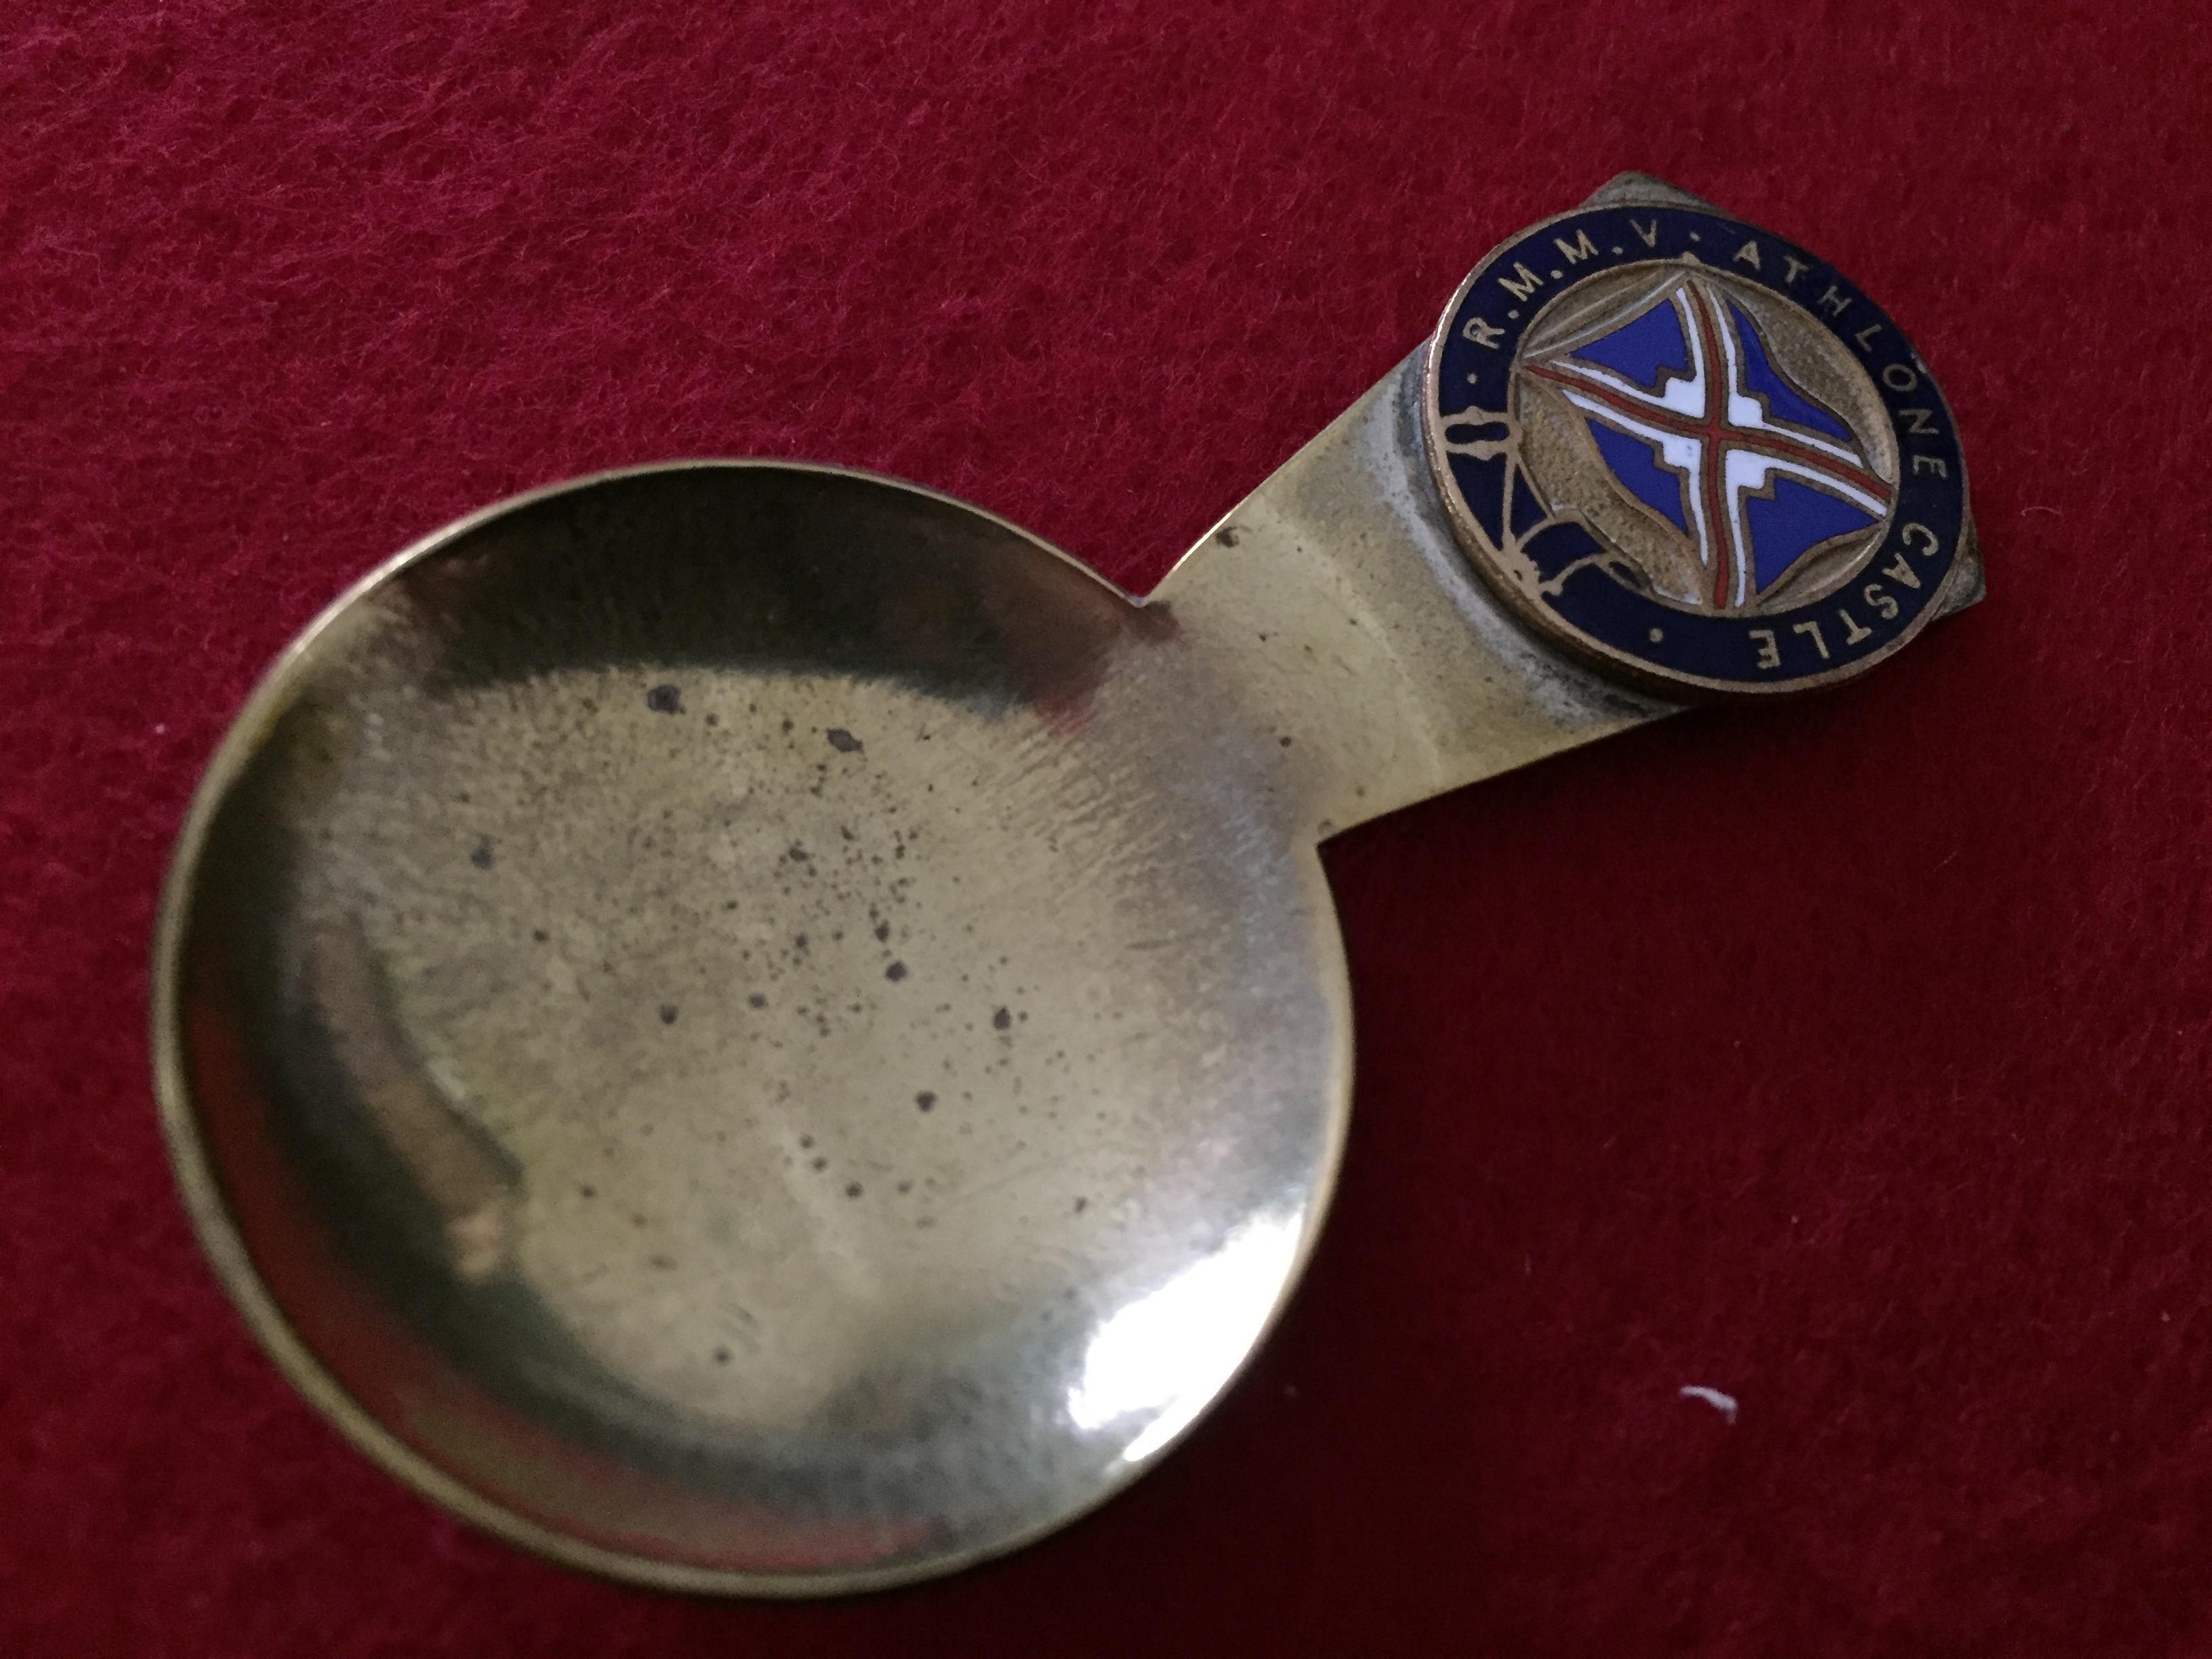 SOUVENIR TEA CADDY SPOON FROM THE UNION CASTLE LINE VESSEL THE RMMV ATHLONE CASTLE